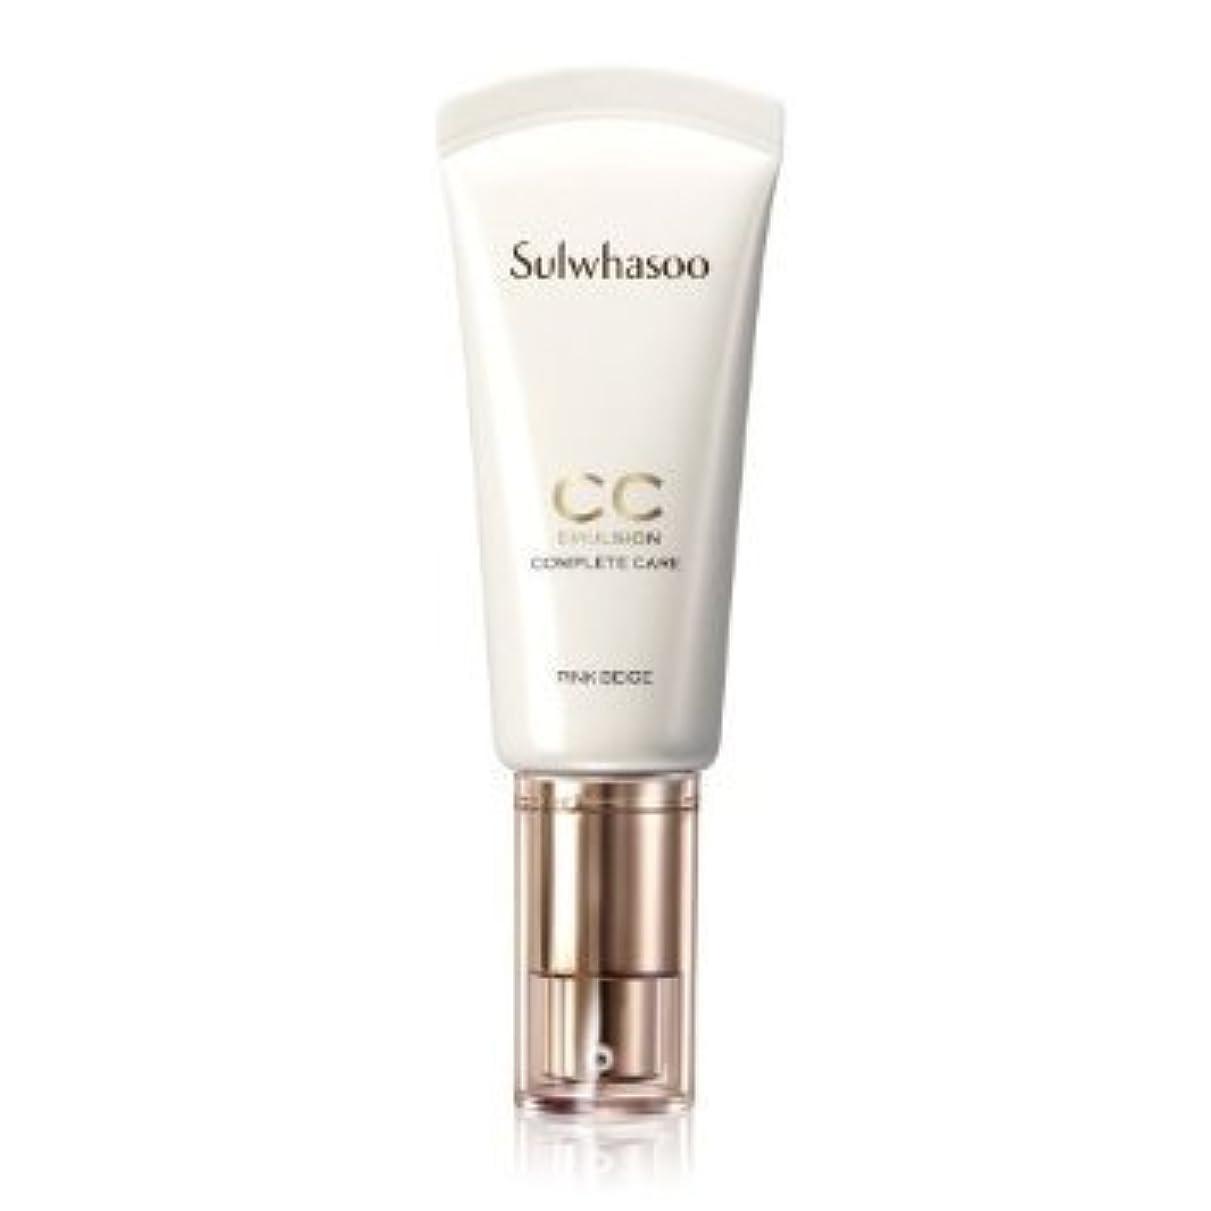 器用空多用途Sulwhasoo CC Emulsion BB Cream Blemish Balm #02 Medium Beige[並行輸入品]